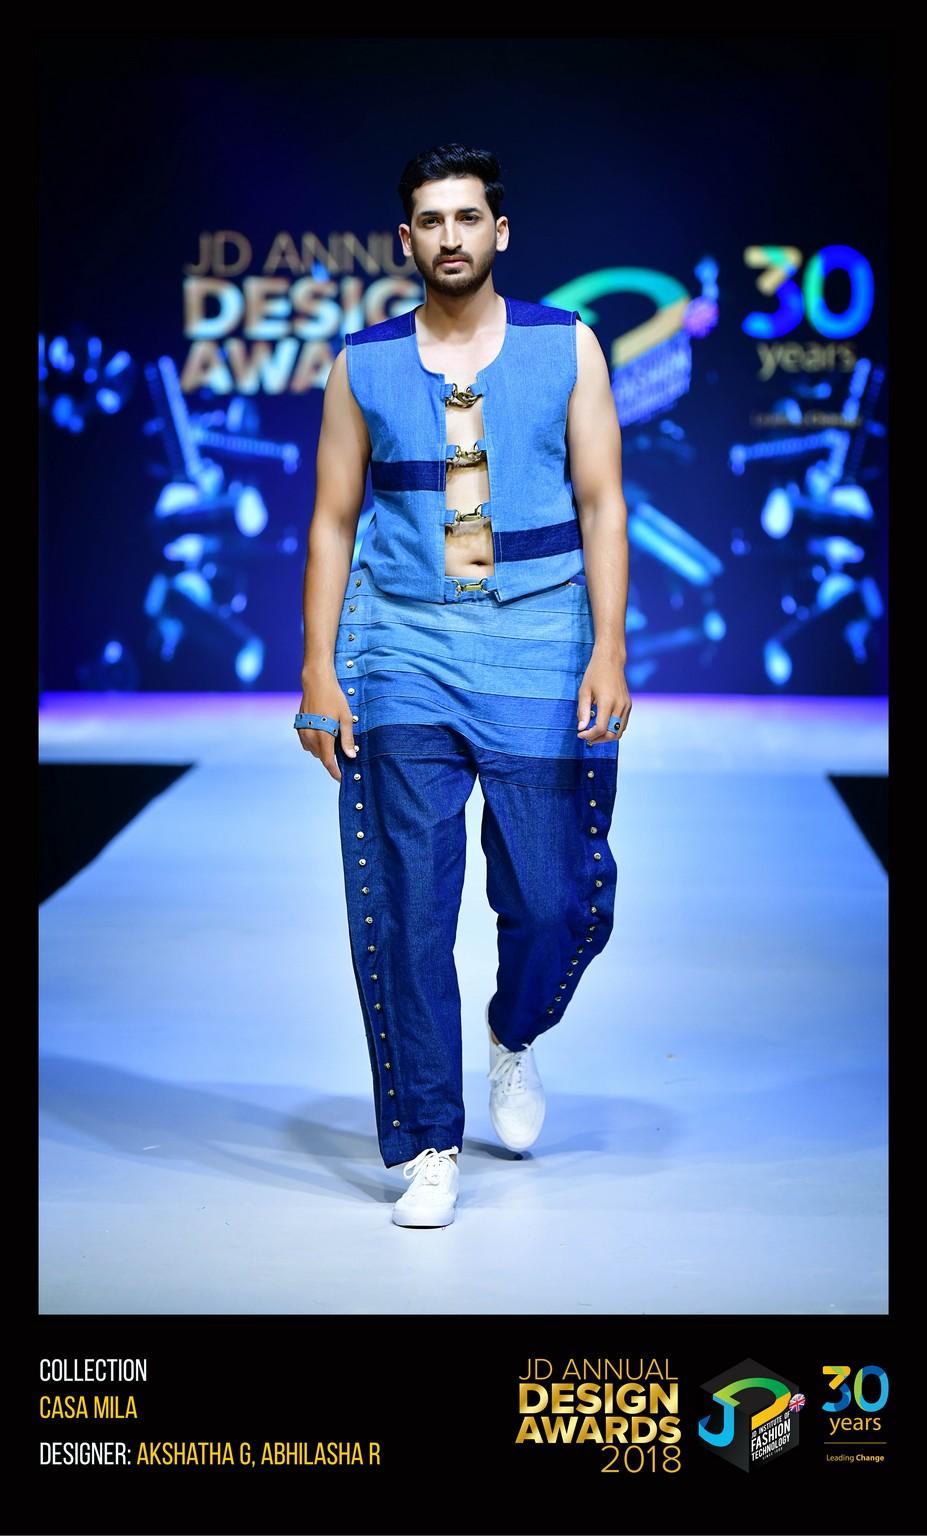 Casa Mila – Change – JD Annual Design Awards 2018 | Designer: Akshata, Sapna and Abhilasha | Photography : Jerin Nath (@jerin_nath) casa mila – change – jd annual design awards 2018 Casa Mila – Change – JD Annual Design Awards 2018 CASA MILA